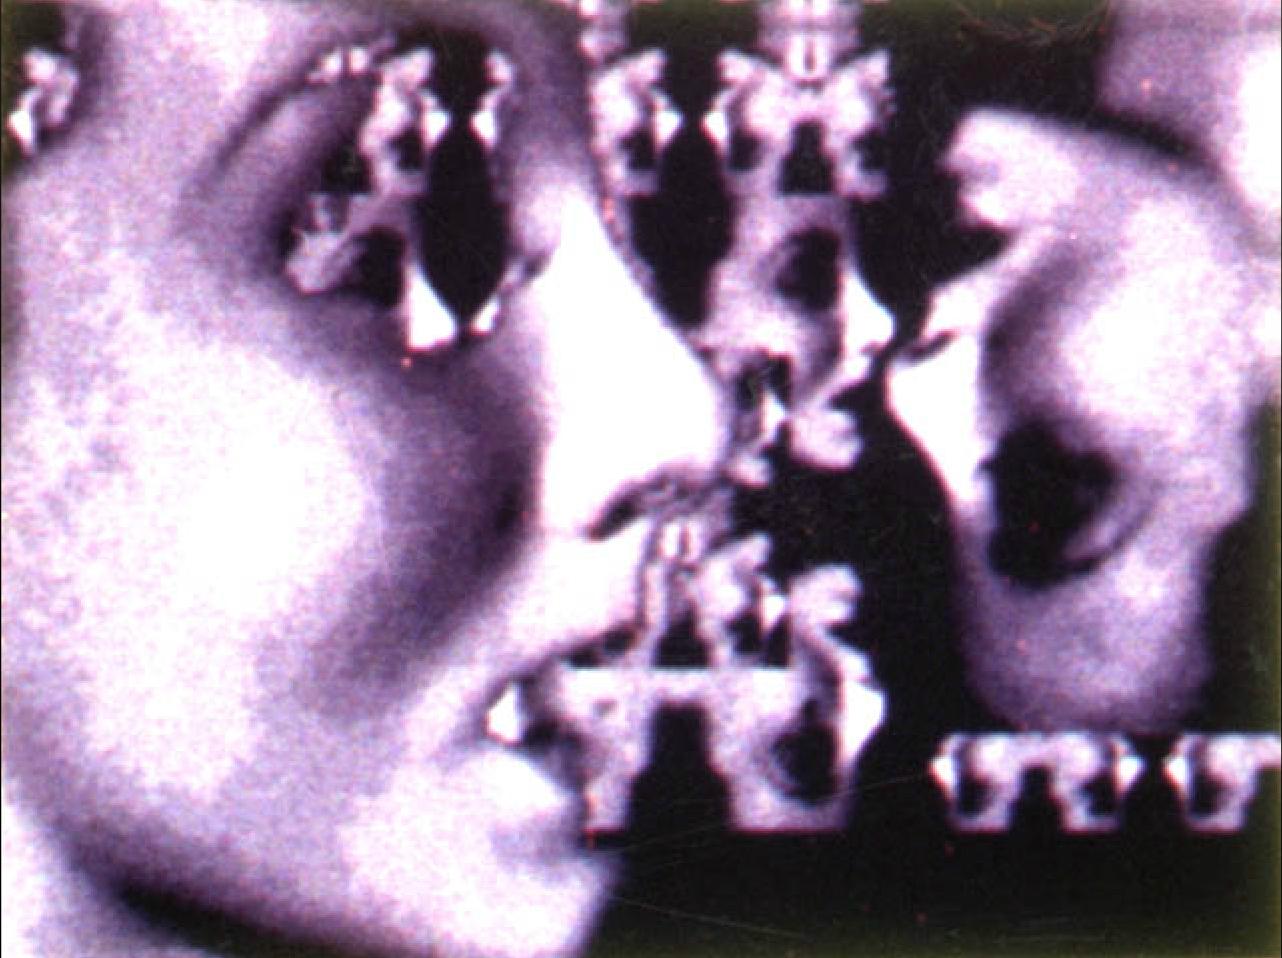 ©1982, Bill Etra, Reflections #3